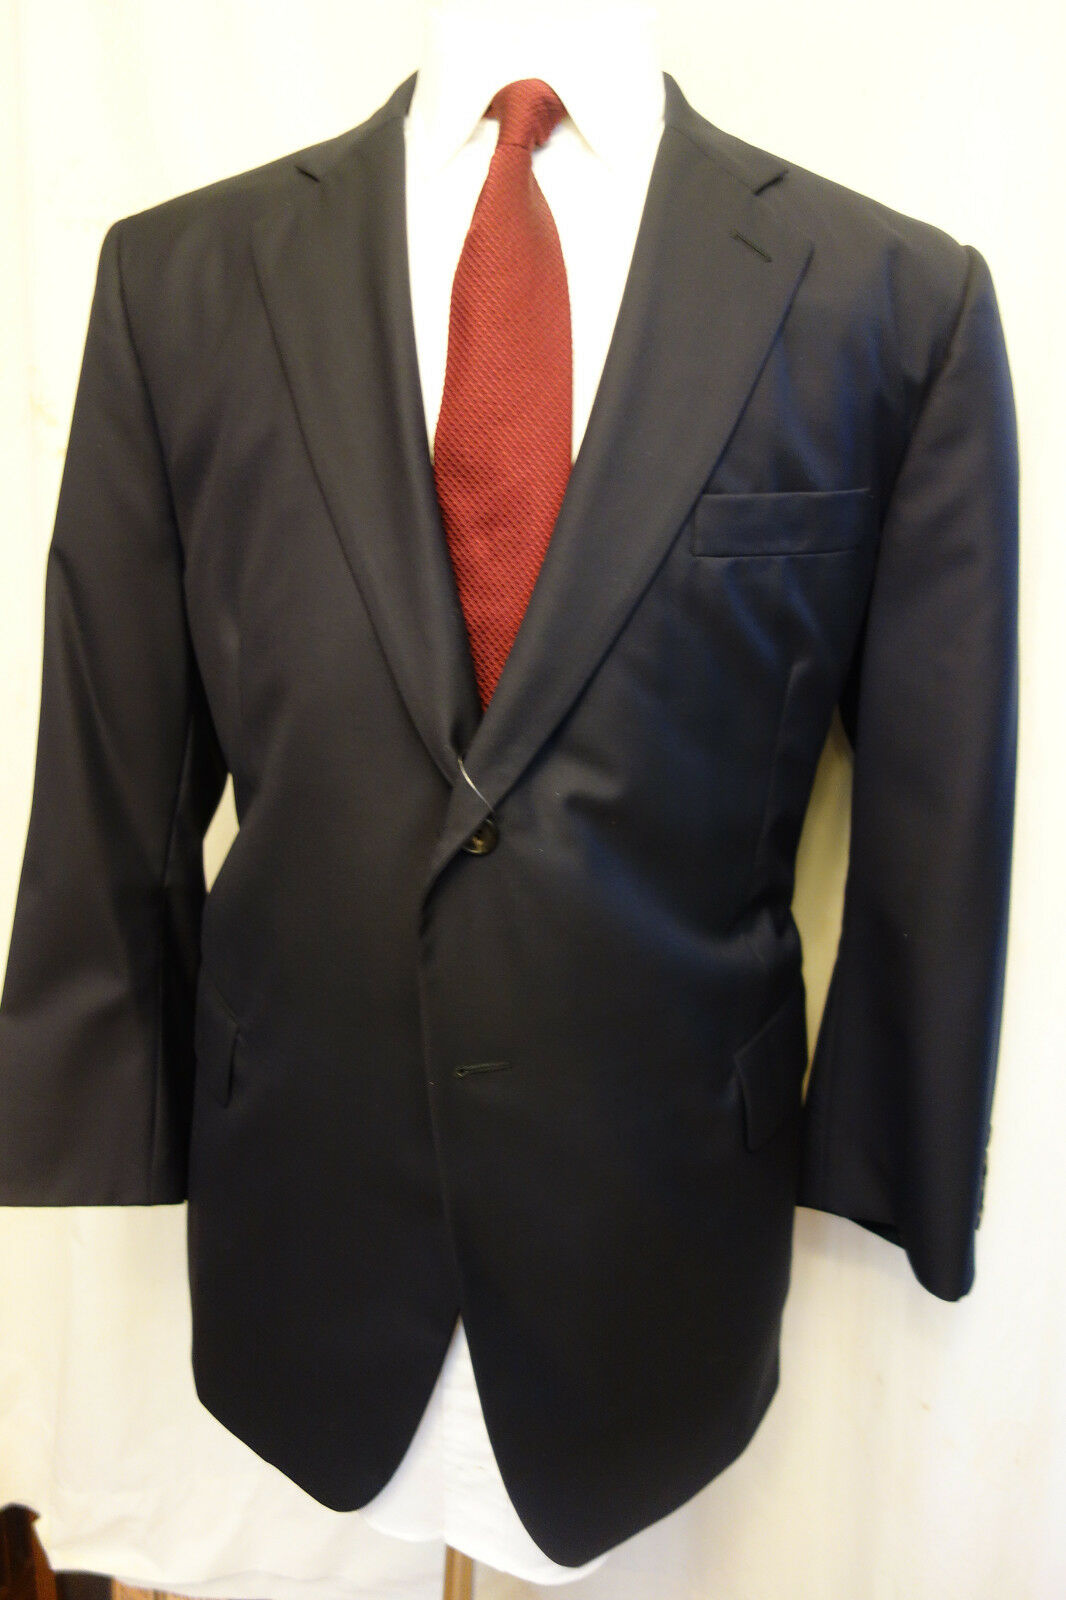 NWOT Brooks Brothers Golden Fleece Navy Blau Wool Blazer 44S or 44XS USA